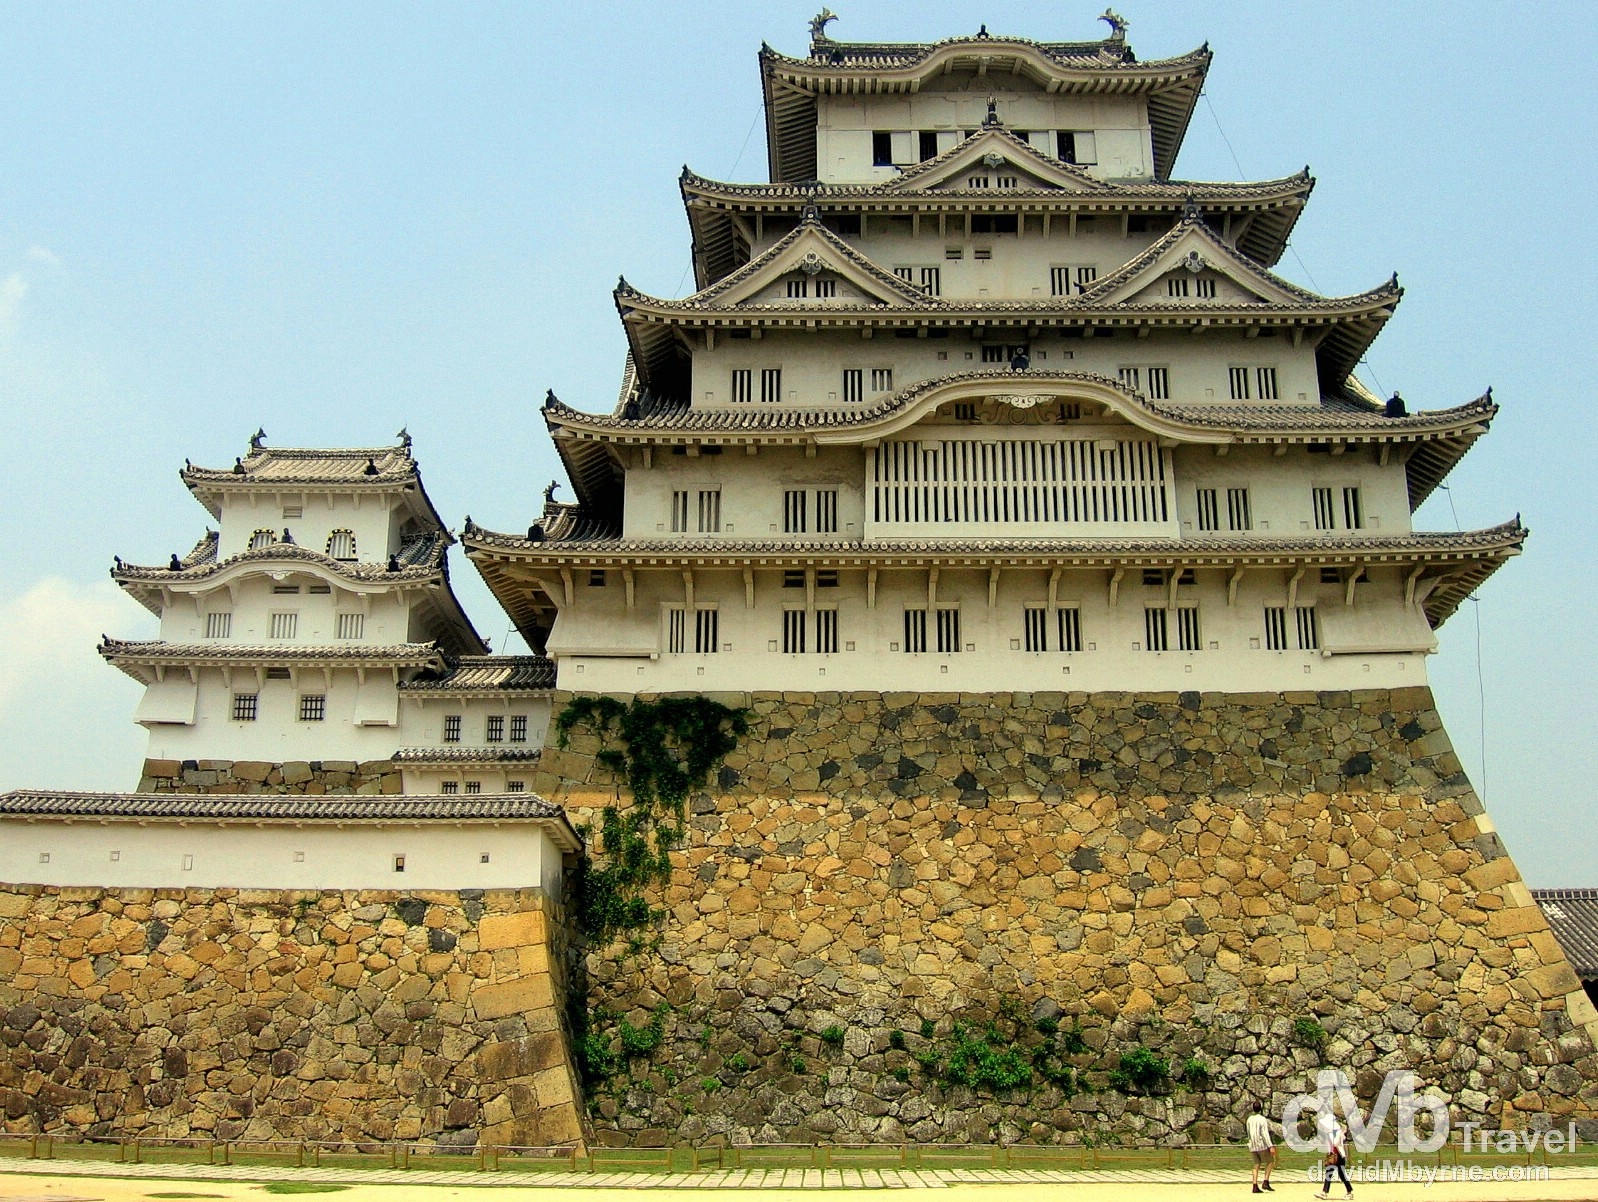 Fronting the massive UNESCO-listed Himeji Castle in Himeji, Honshu, Japan. July 21st, 2005.